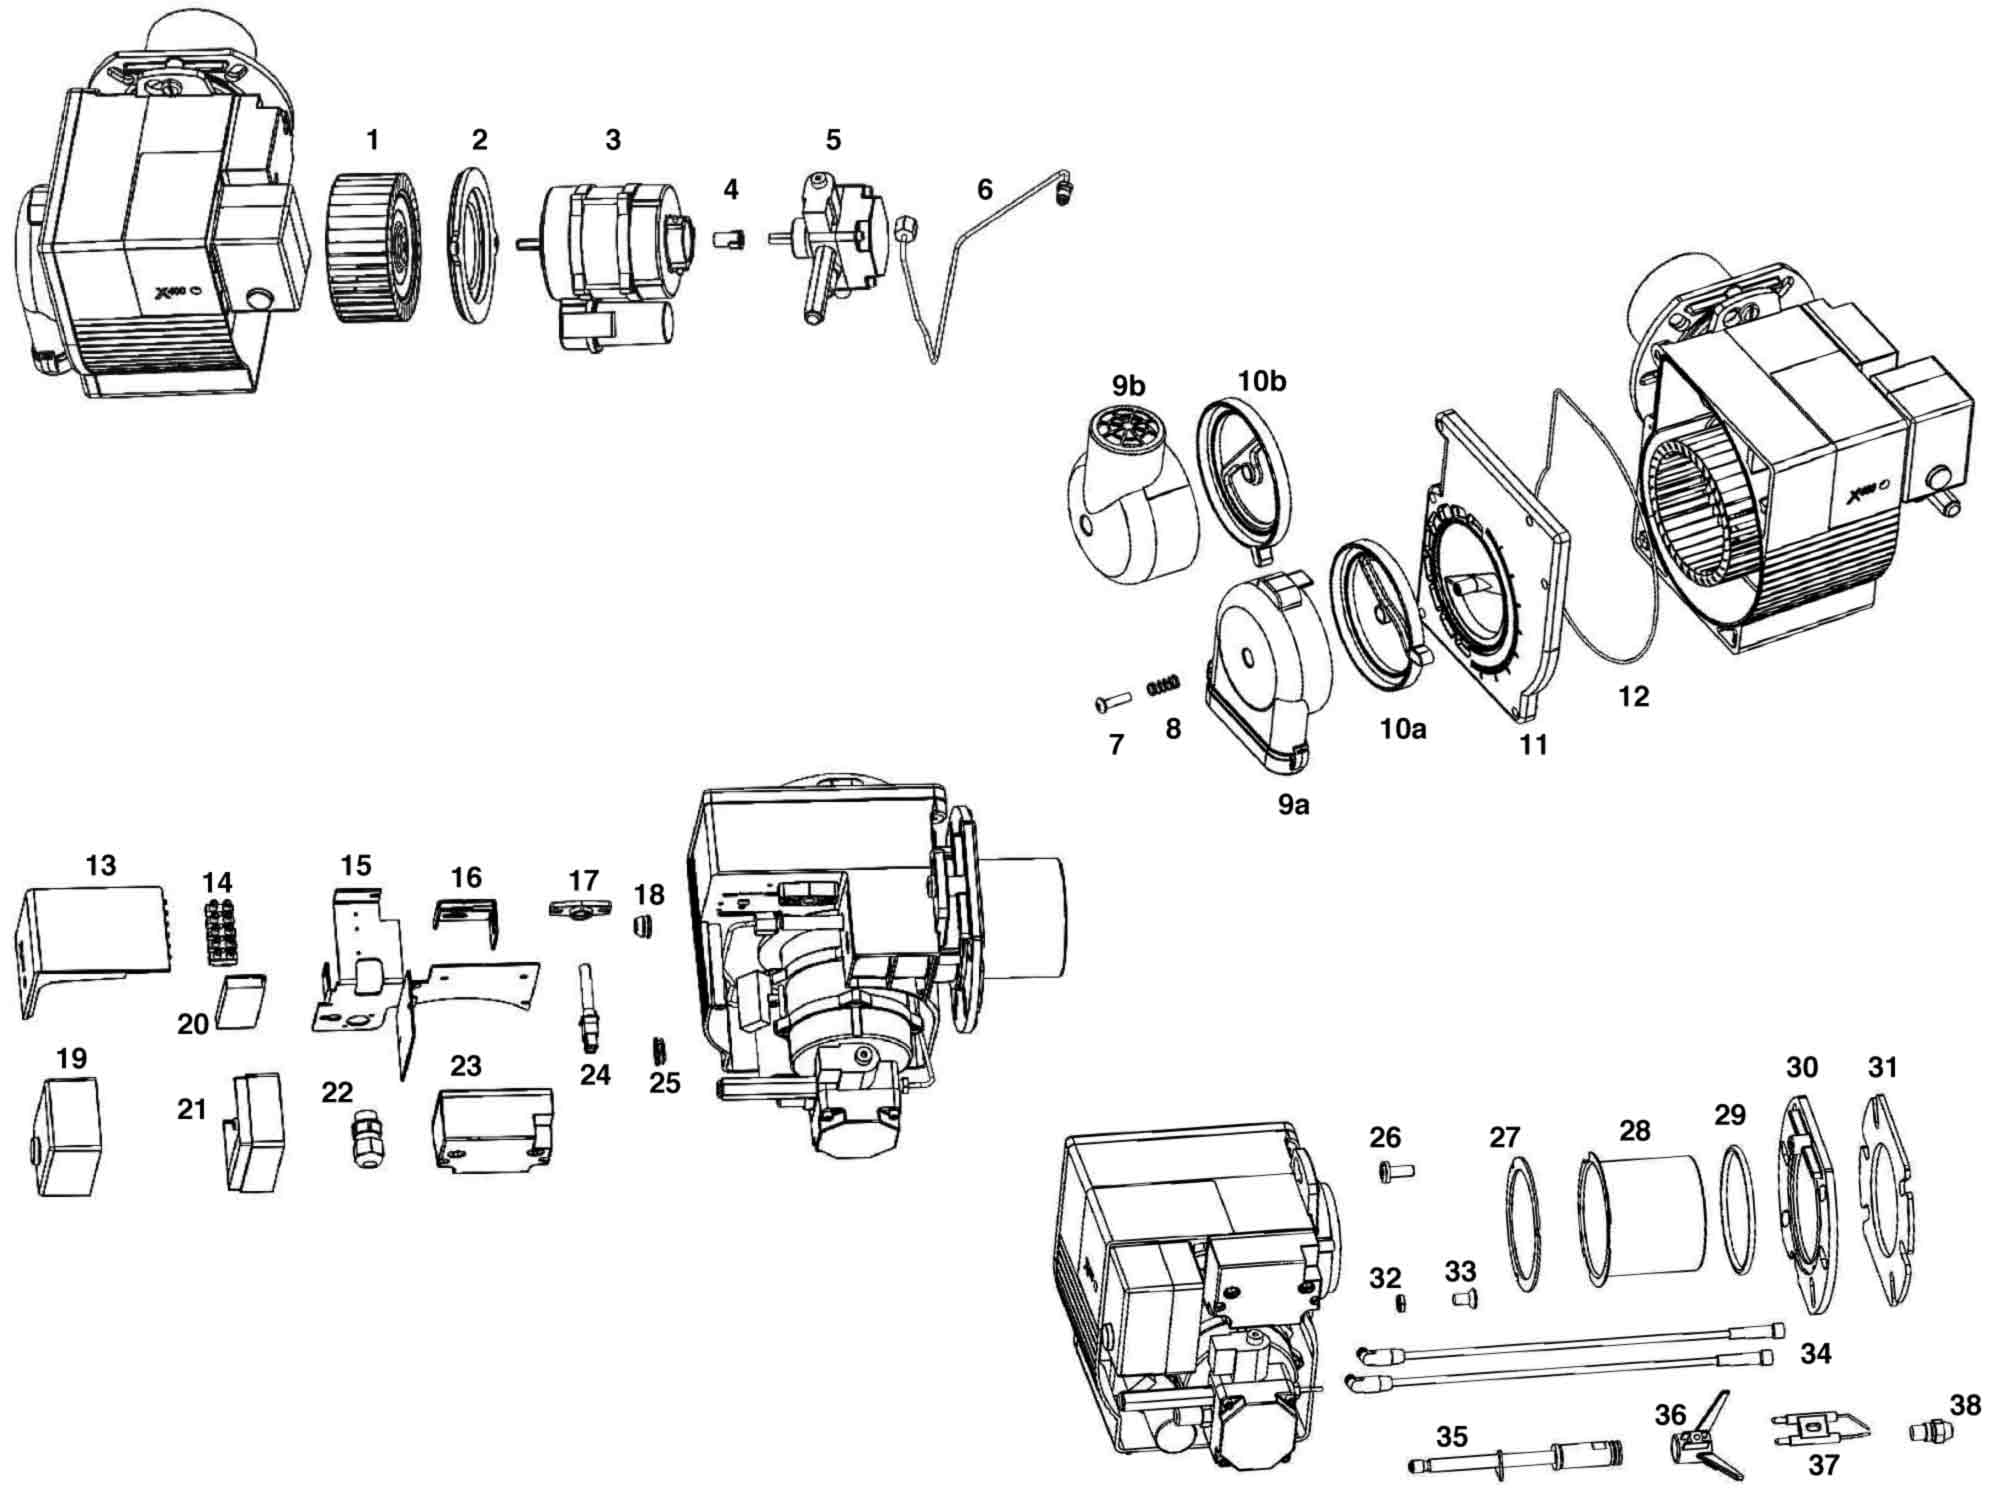 Eogb X400 Oil Burner Parts